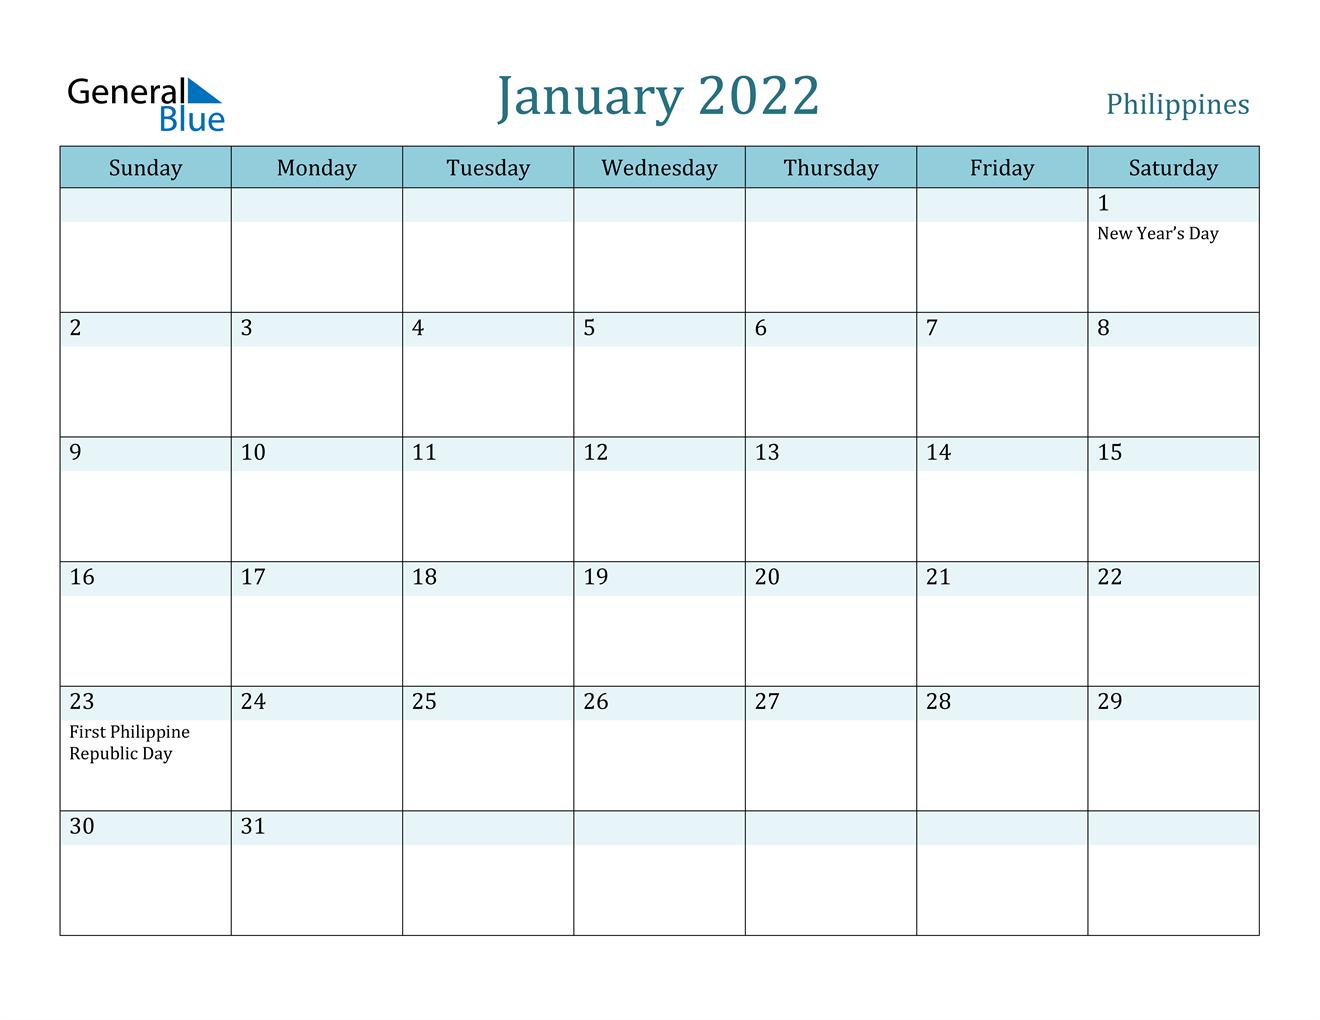 January 2022 Calendar - Philippines Intended For Printable Calendar January 2022